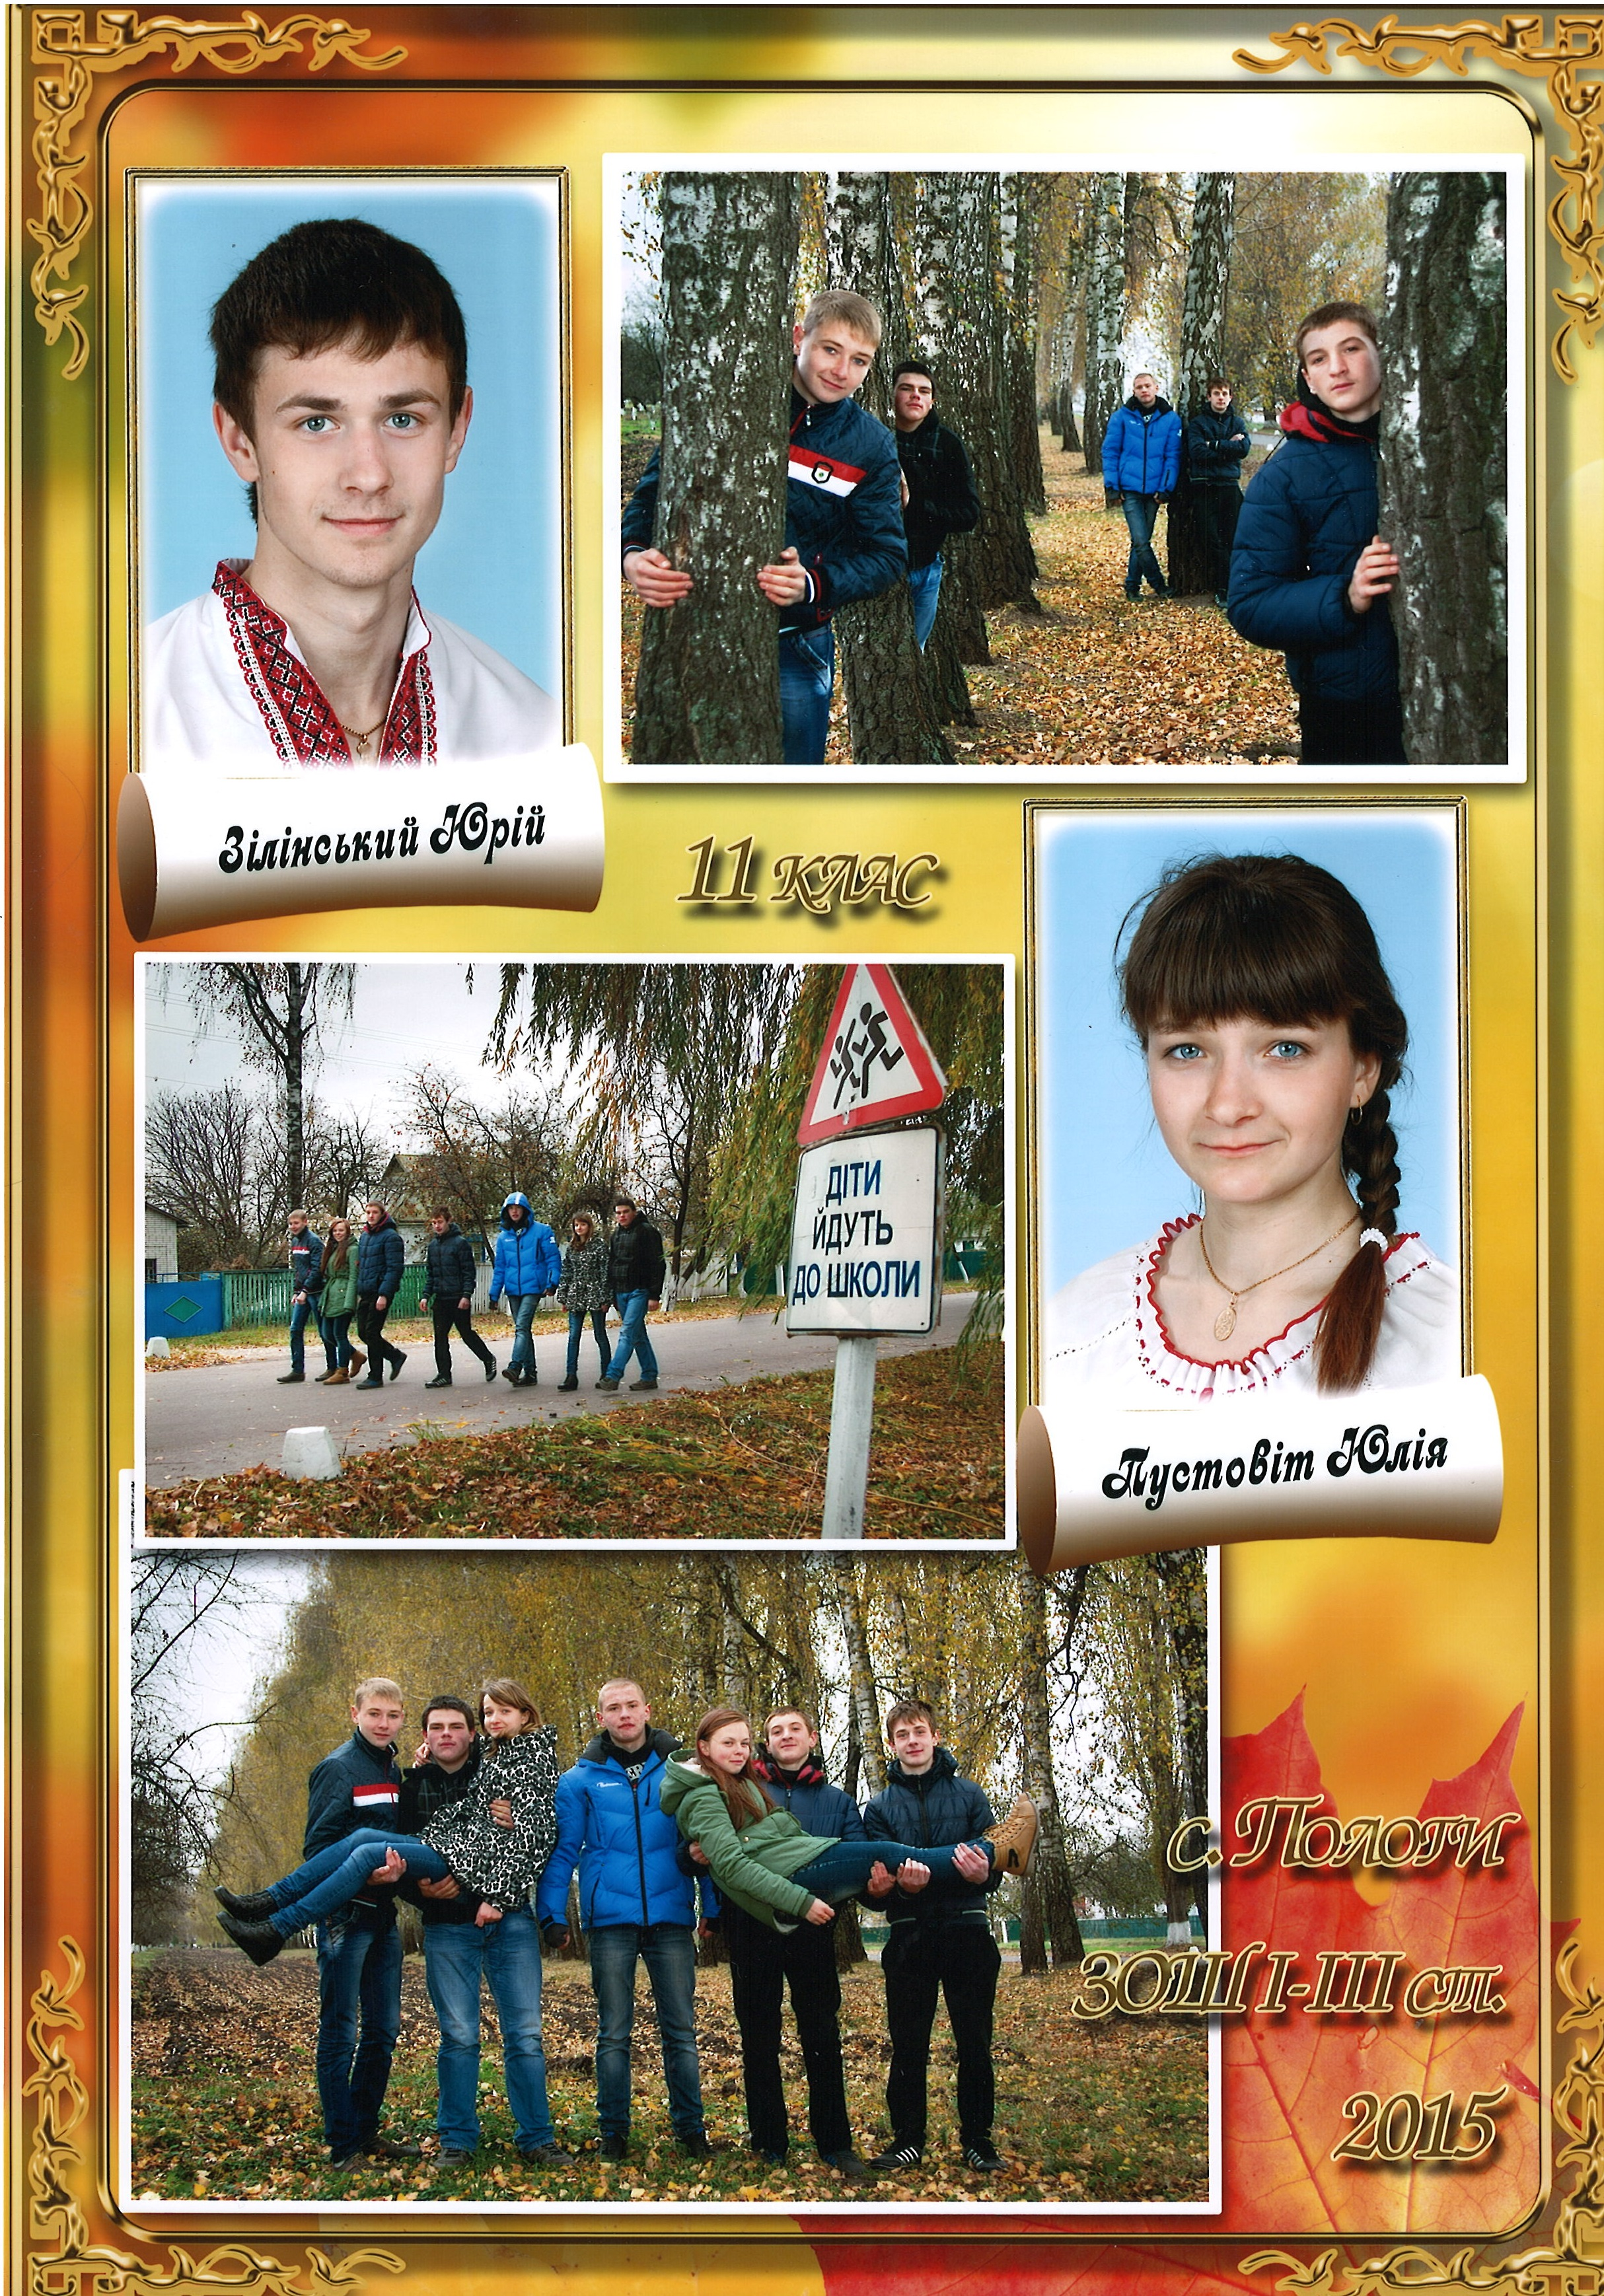 11 клас 4 Випуск 2015 (11 клас)